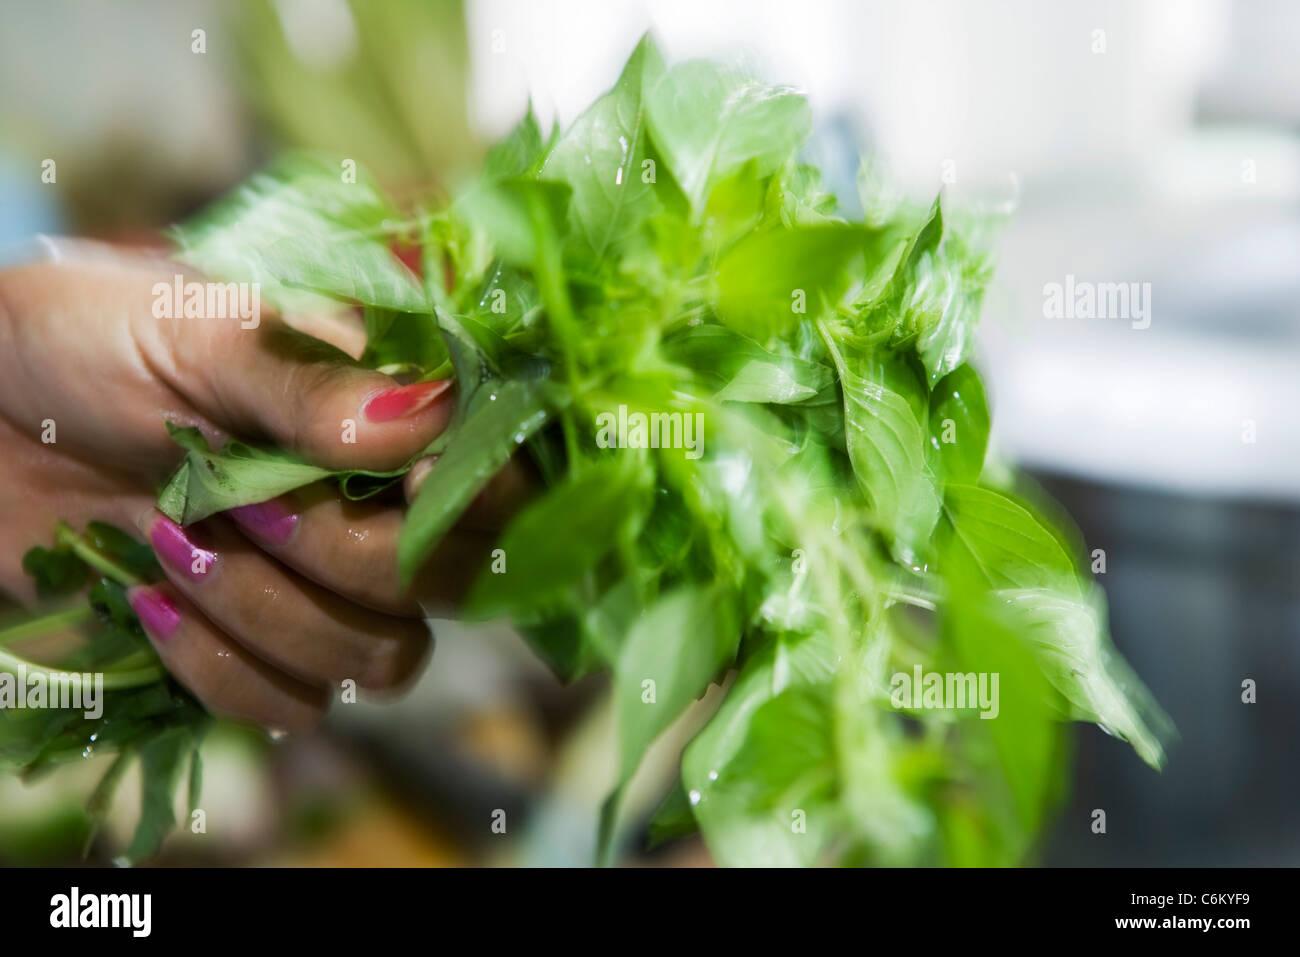 Holding bunch of fresh basil - Stock Image